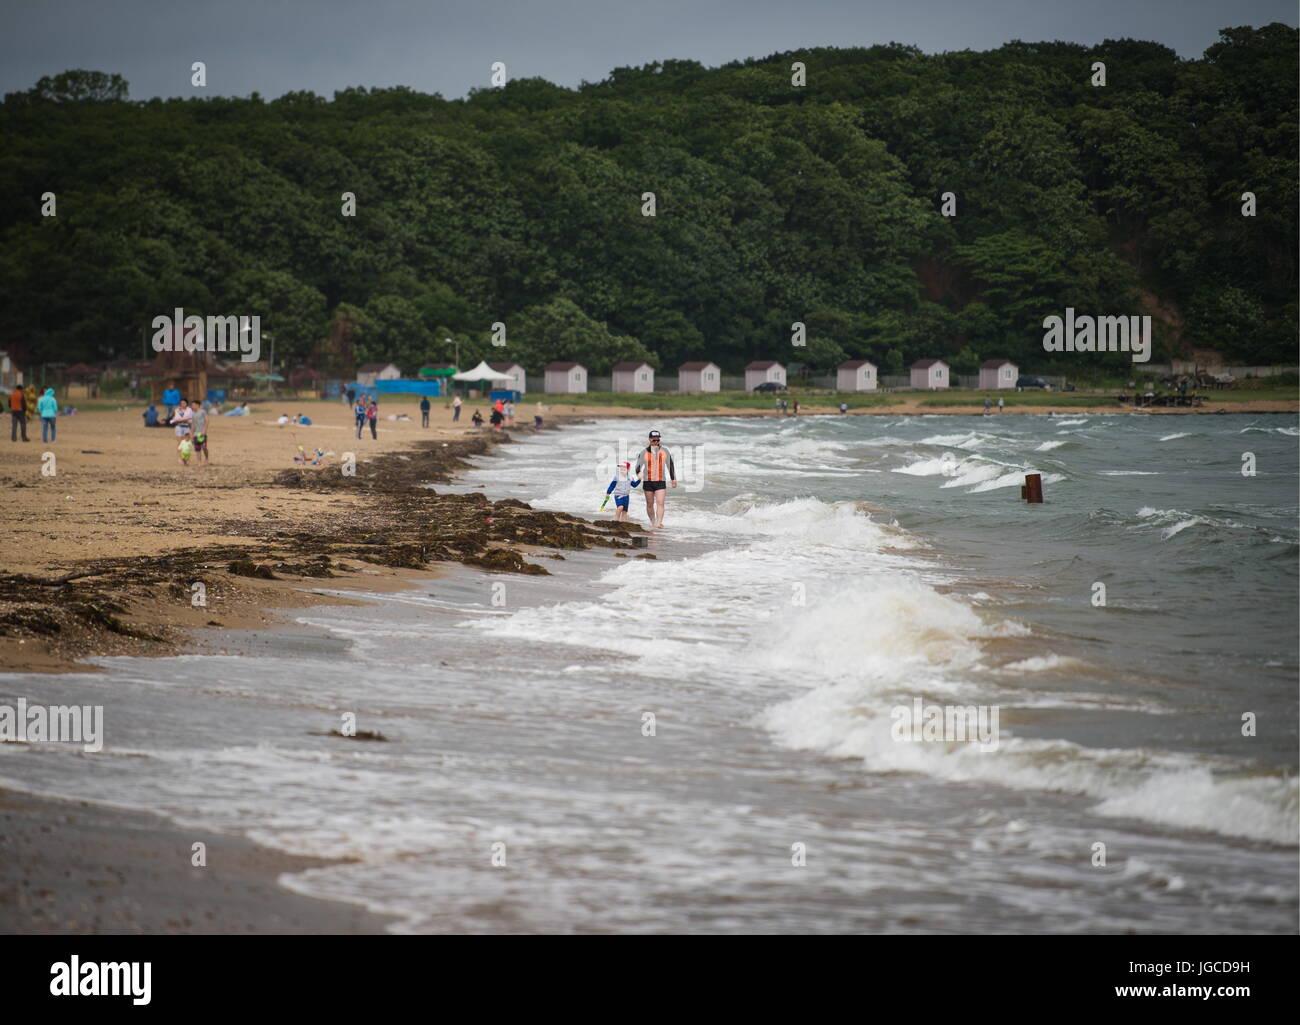 VLADIVOSTOK, RUSSIA - JUNE 25, 2017: People on the beach in Lazurnaya Bay in the city of Vladivostok on Russia's - Stock Image